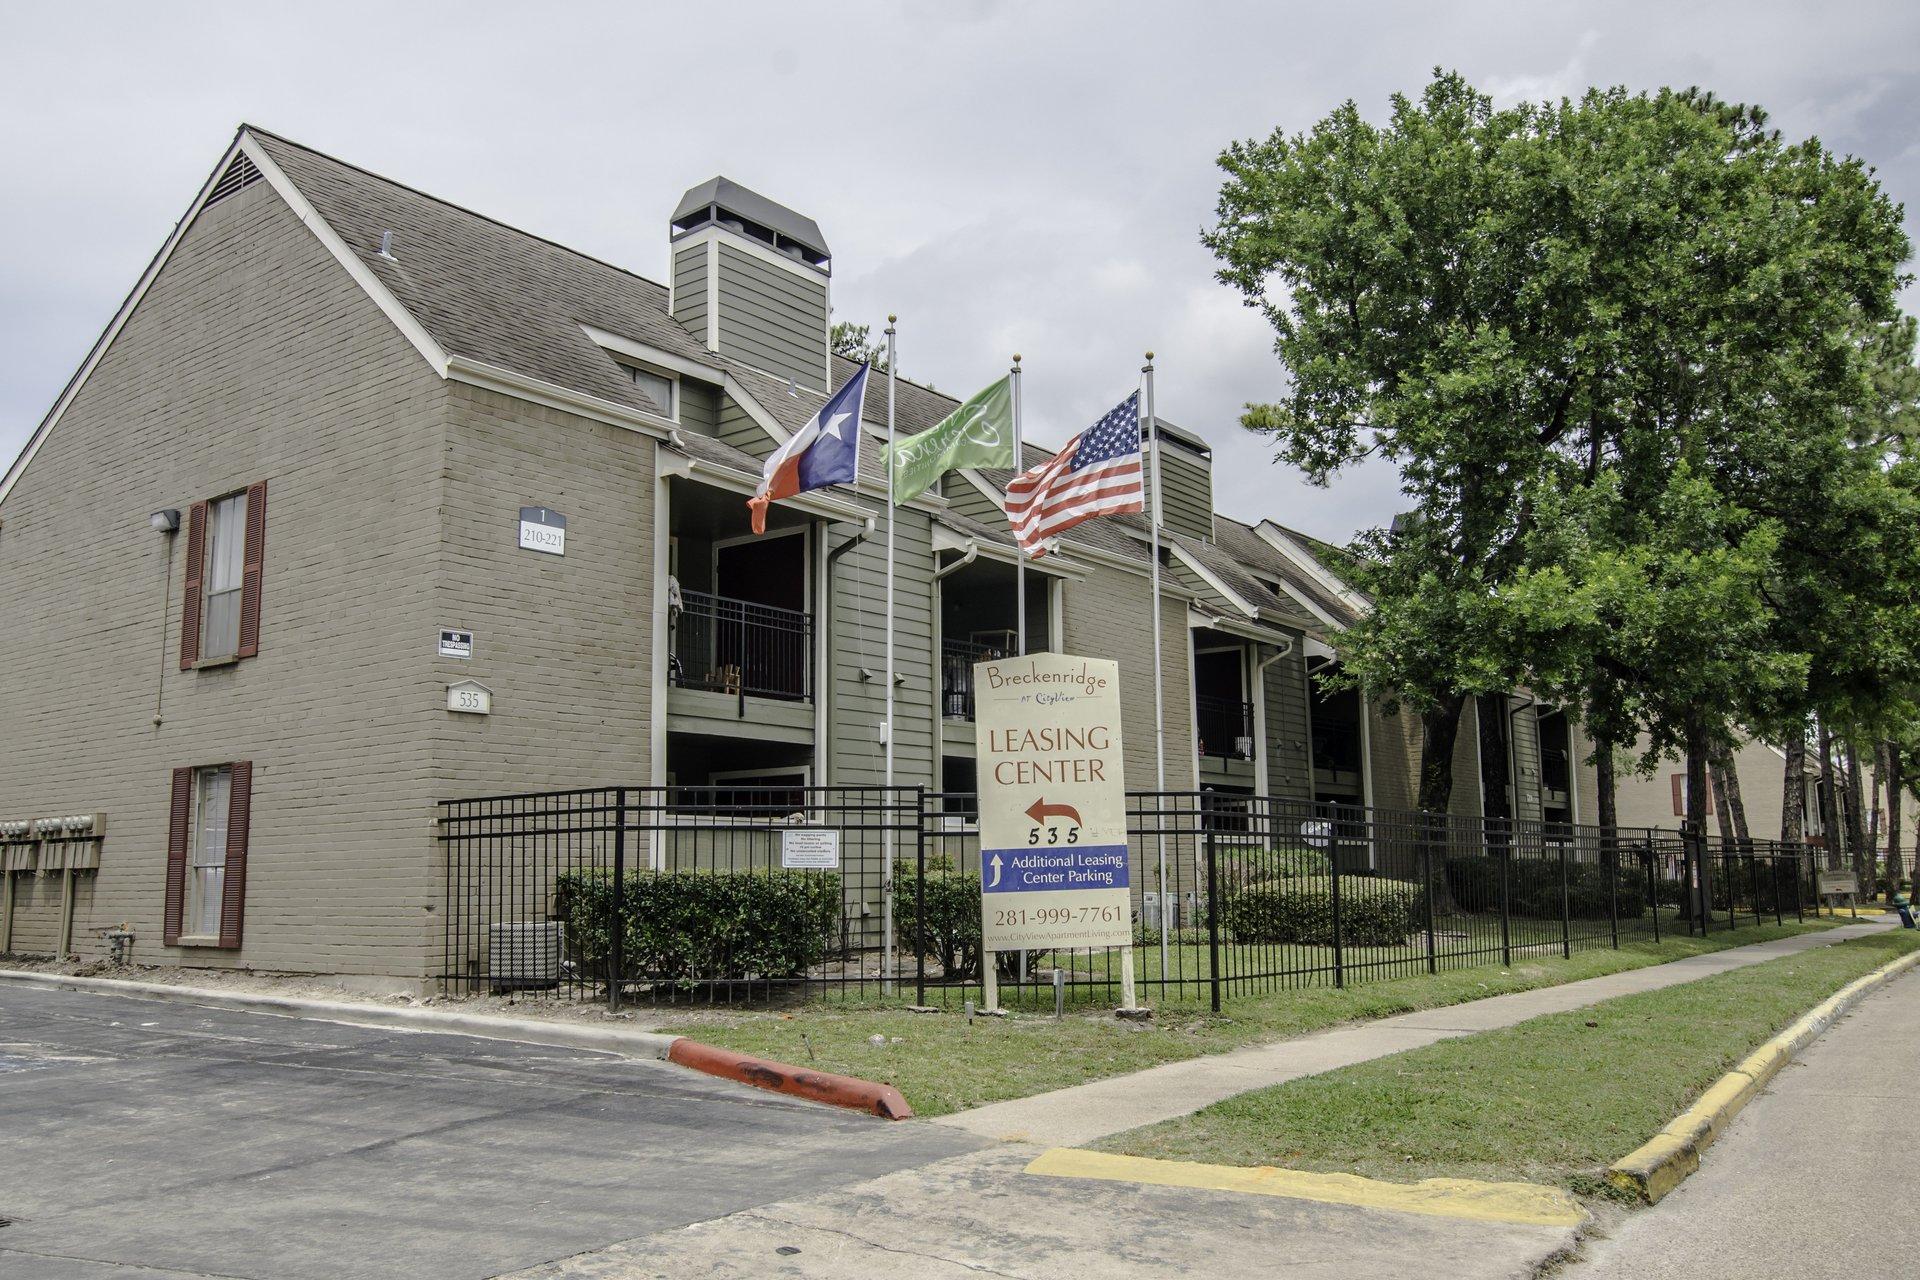 Breckenridge at Cityview Apartment Complex